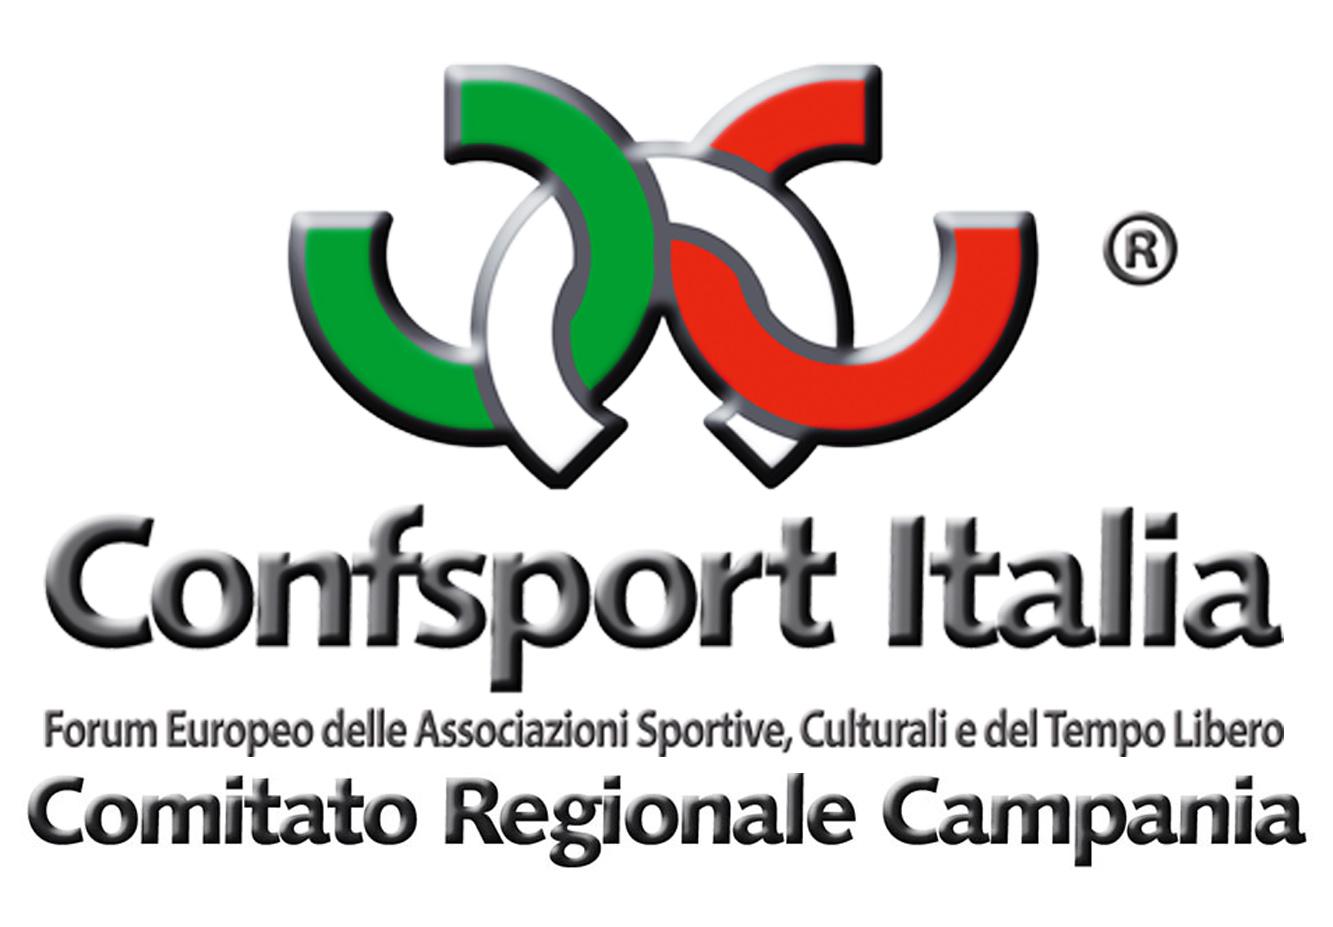 Calendario Regionale Campania Scuola.Regione Campania Confsport Italia